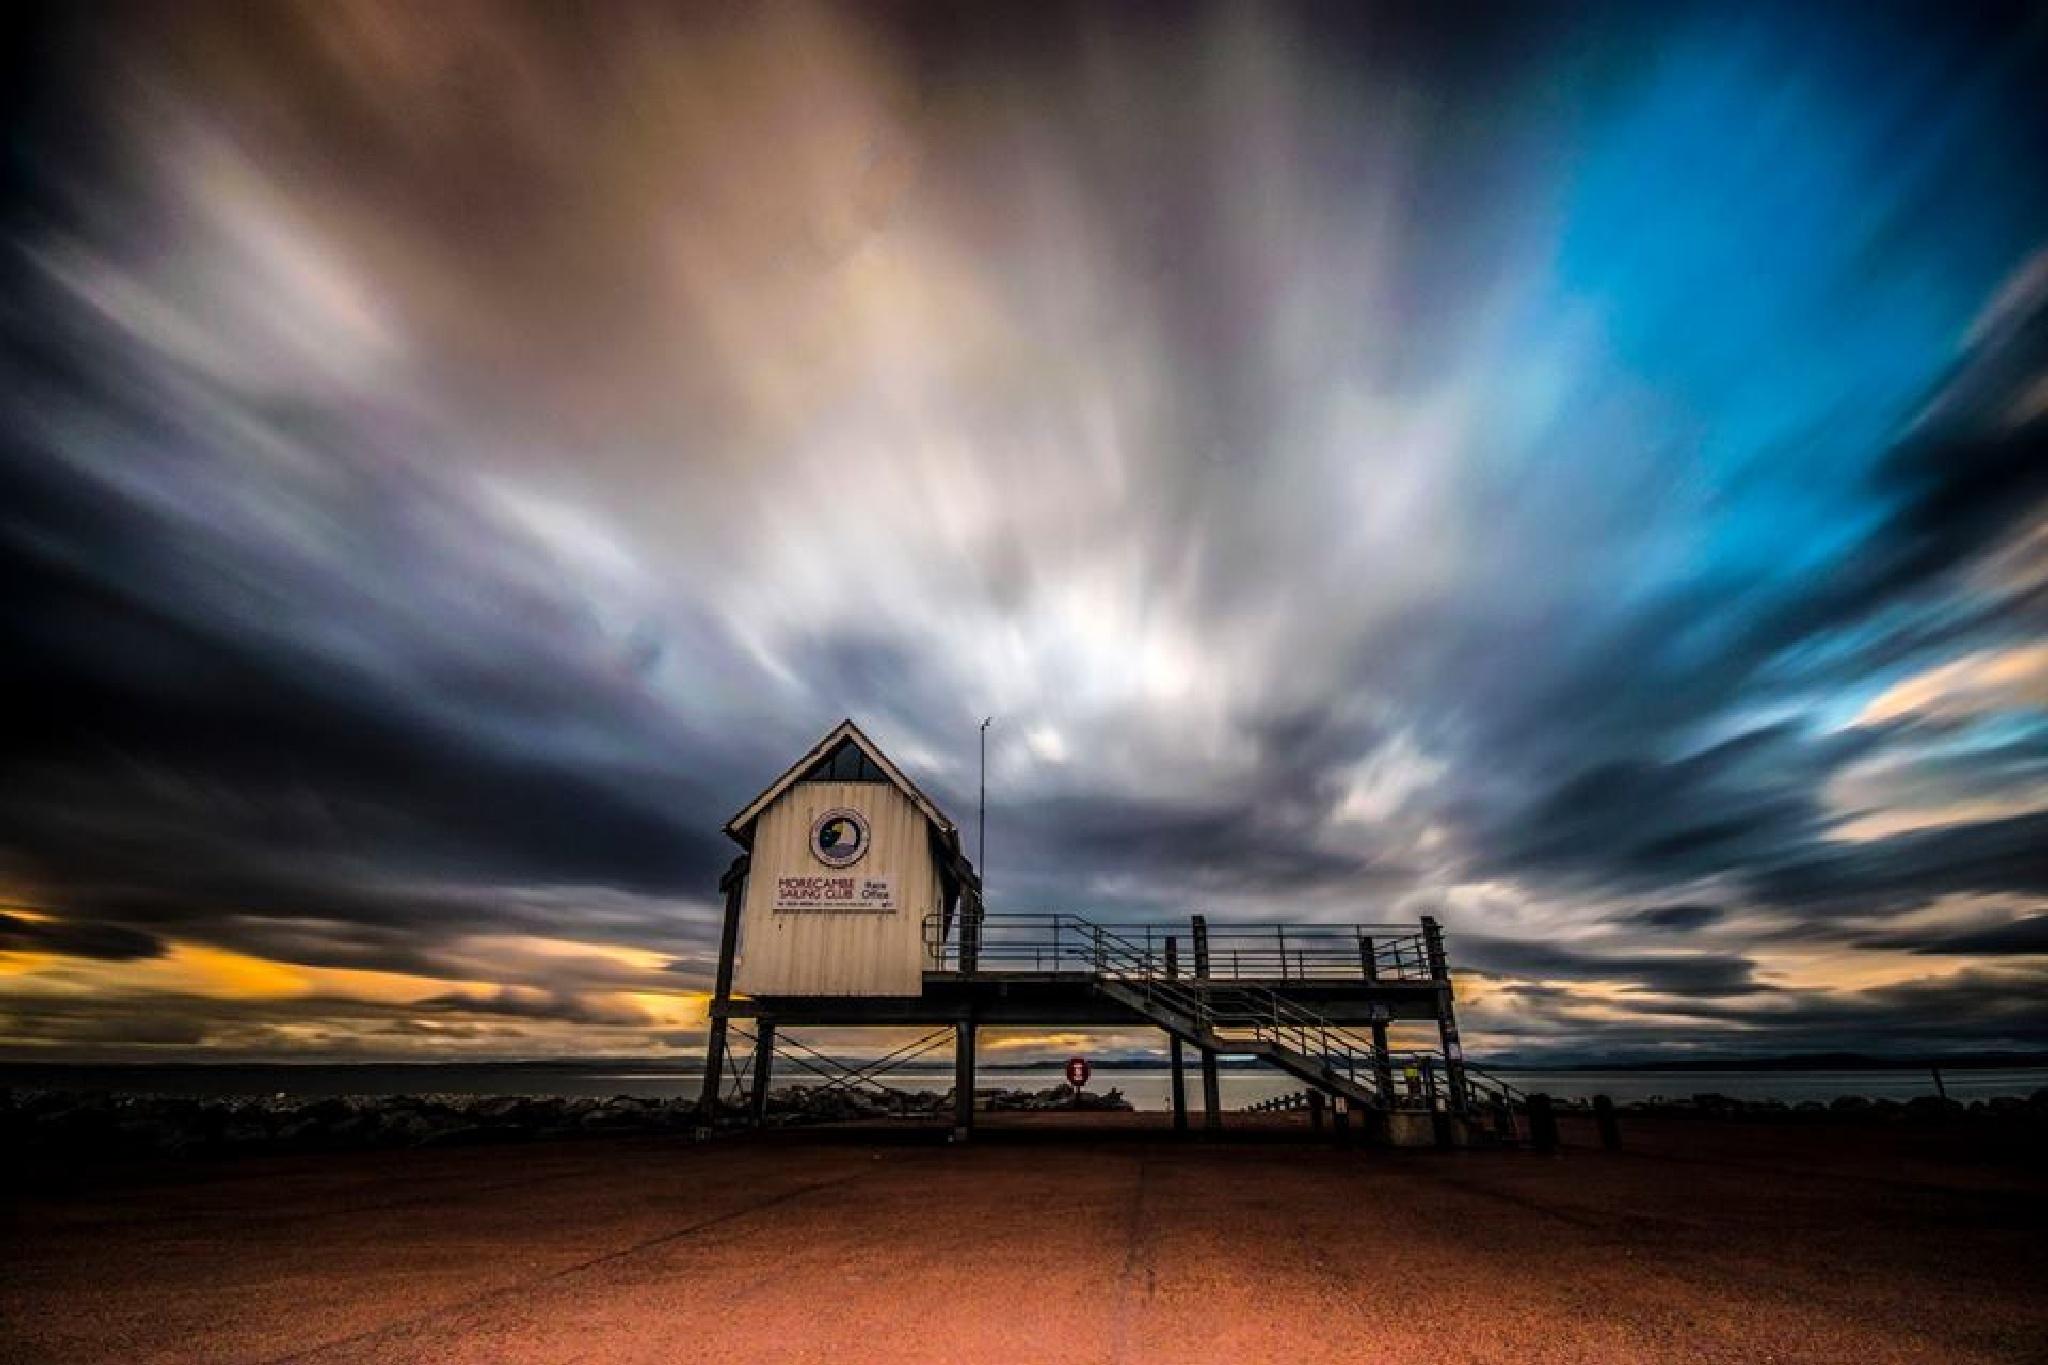 Morecambe Lifeboat Station by Meldrew